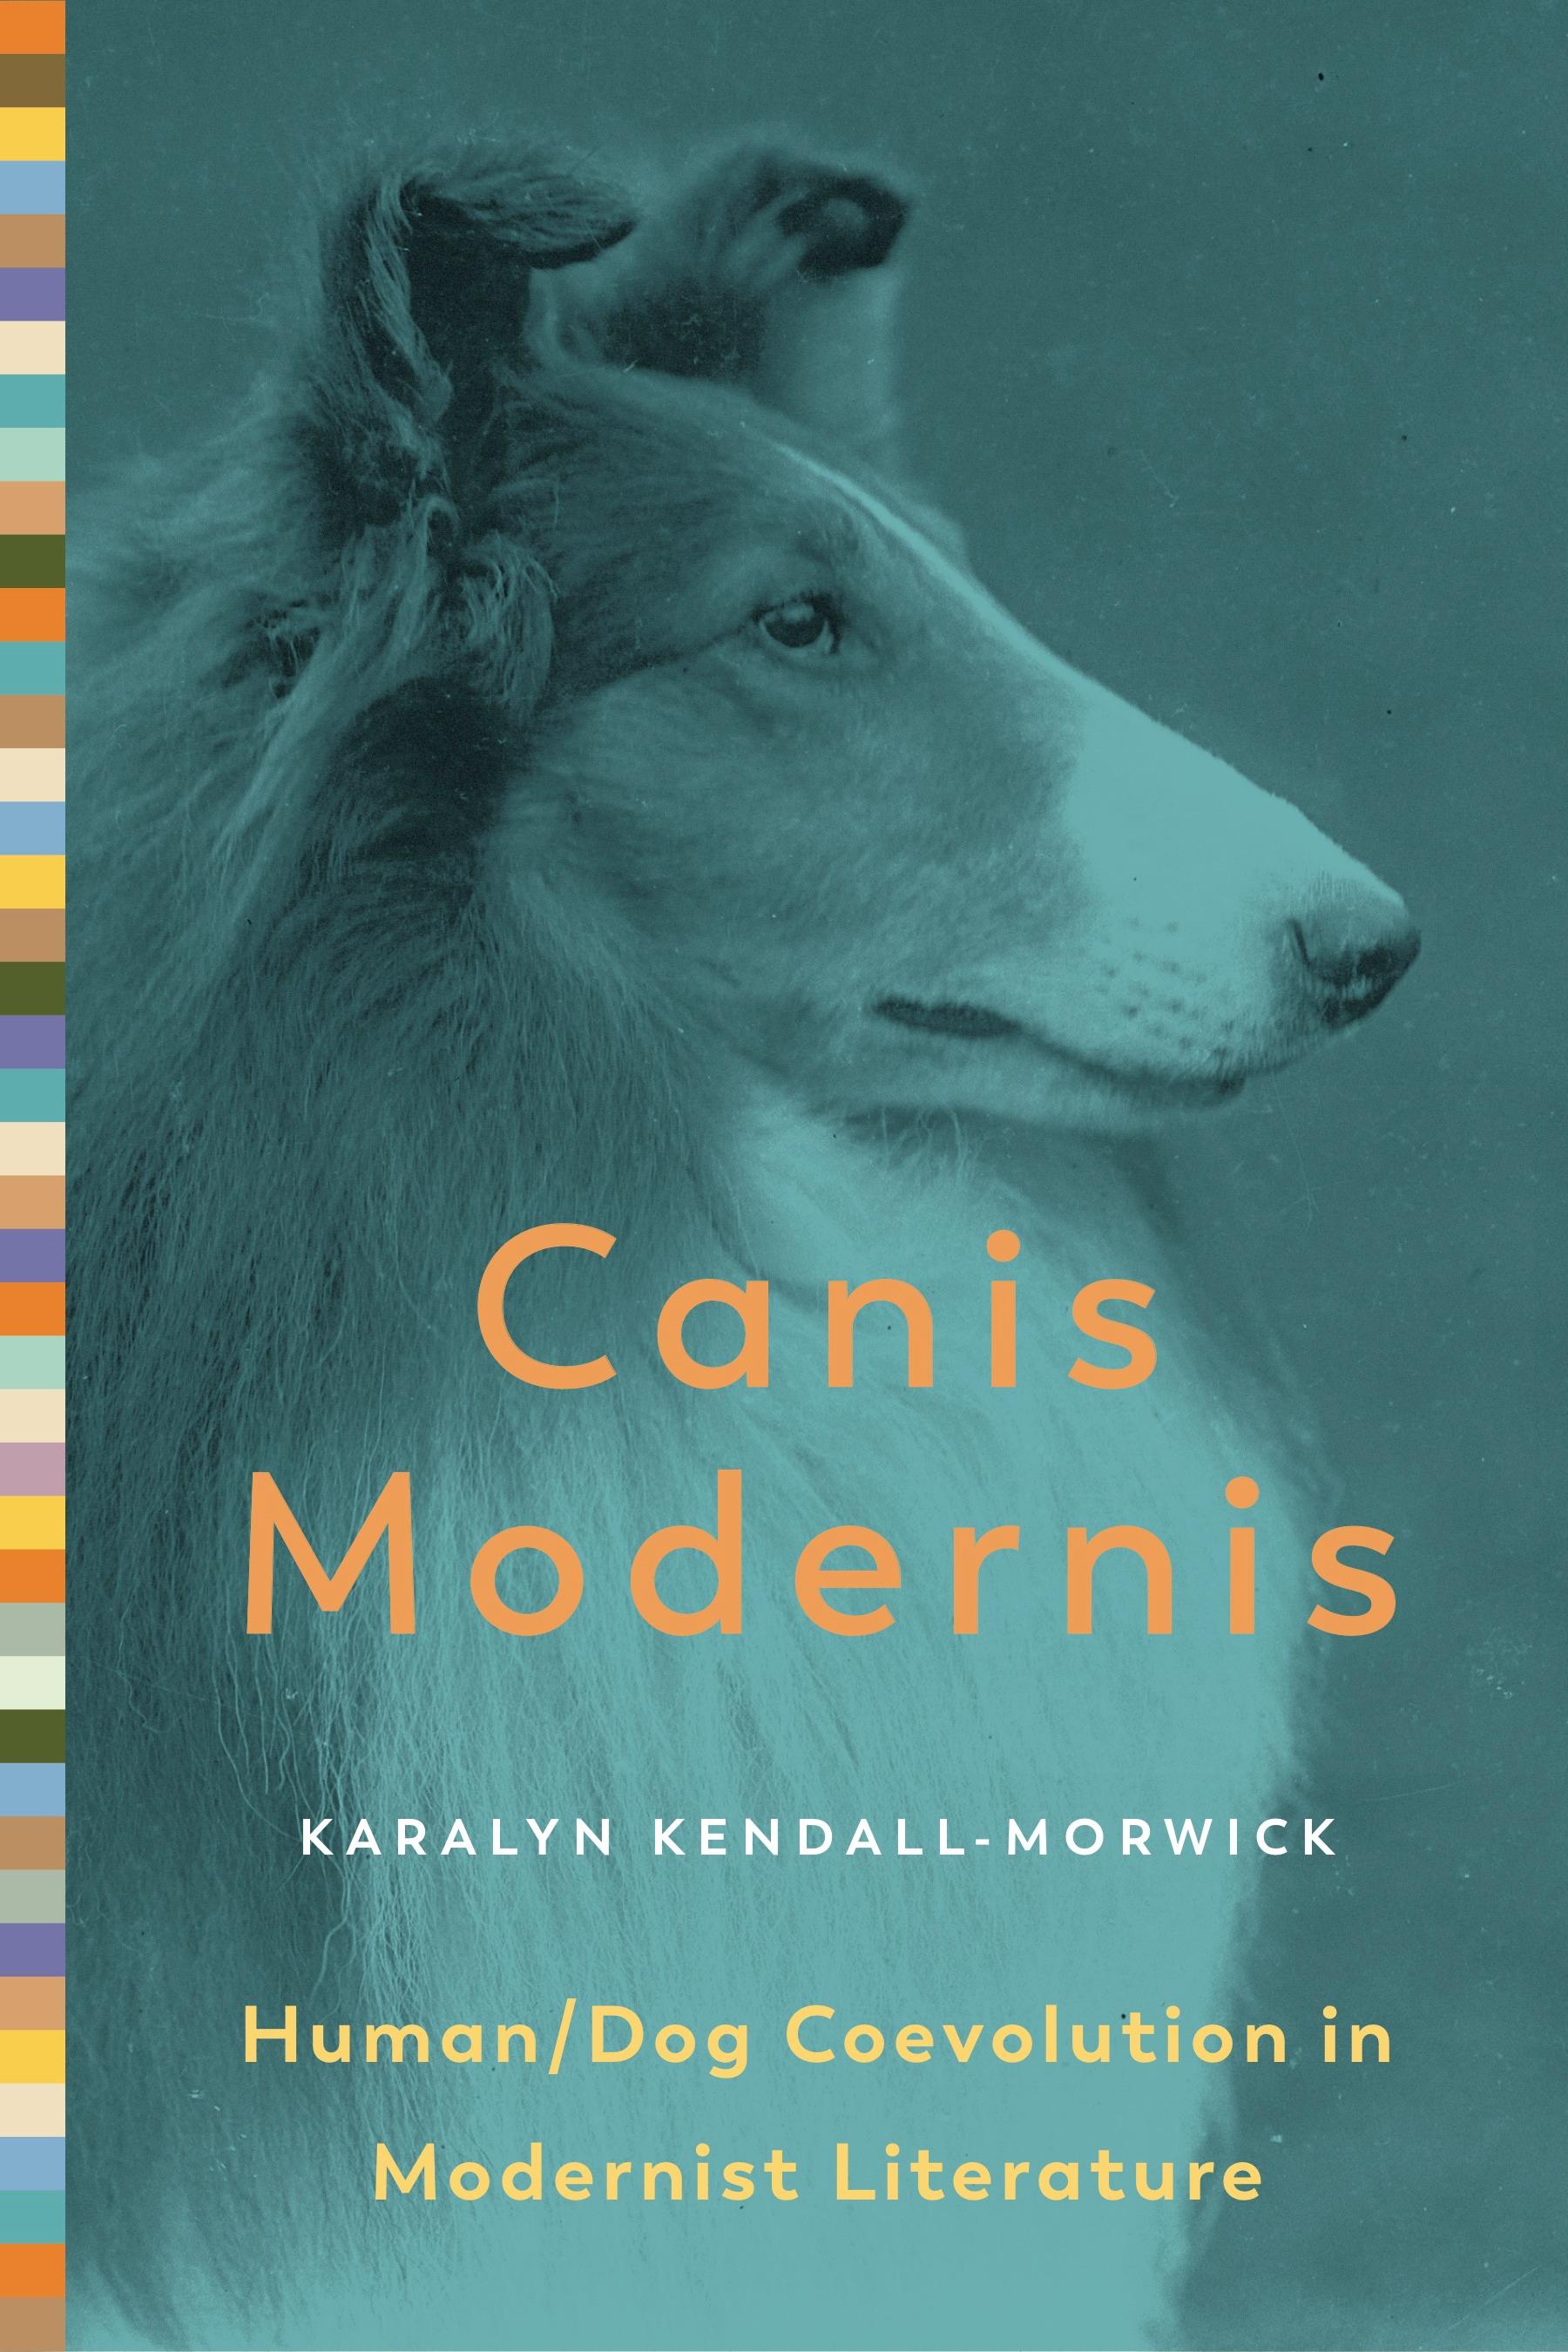 Canis Modernis